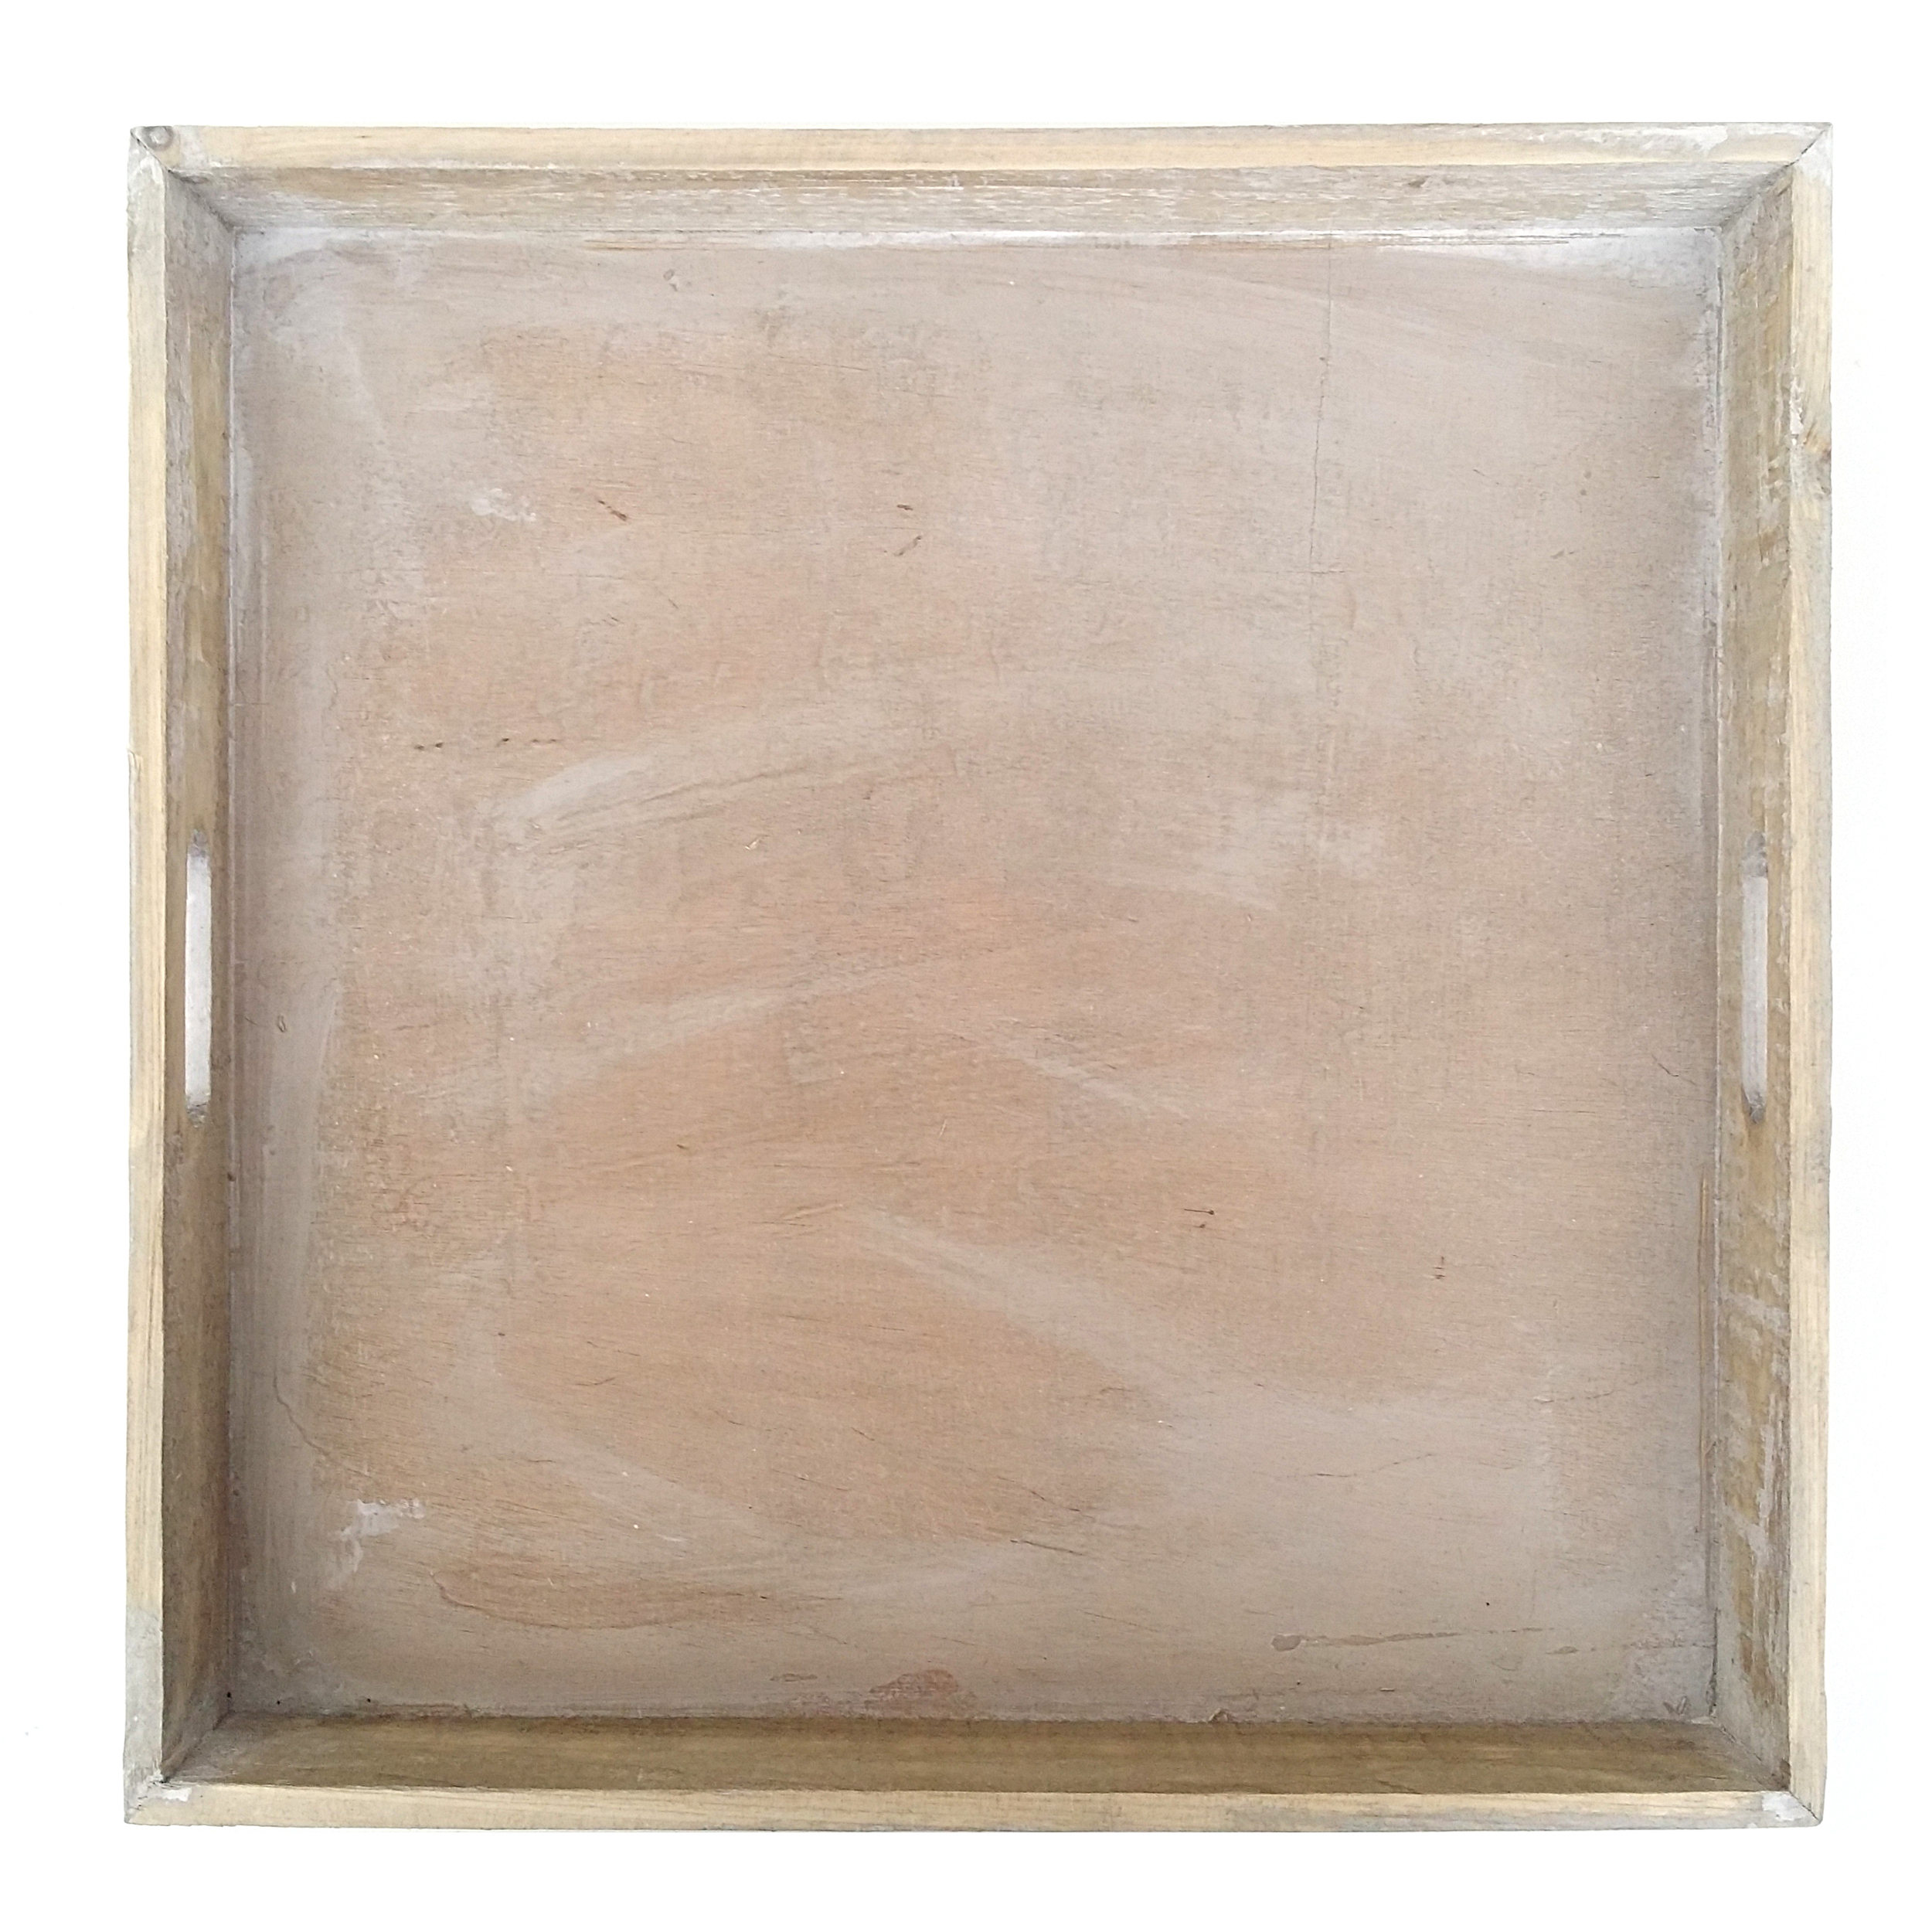 3er tablett set holz gek lkt gross quadratisch kerzentablett dekotablett neu. Black Bedroom Furniture Sets. Home Design Ideas